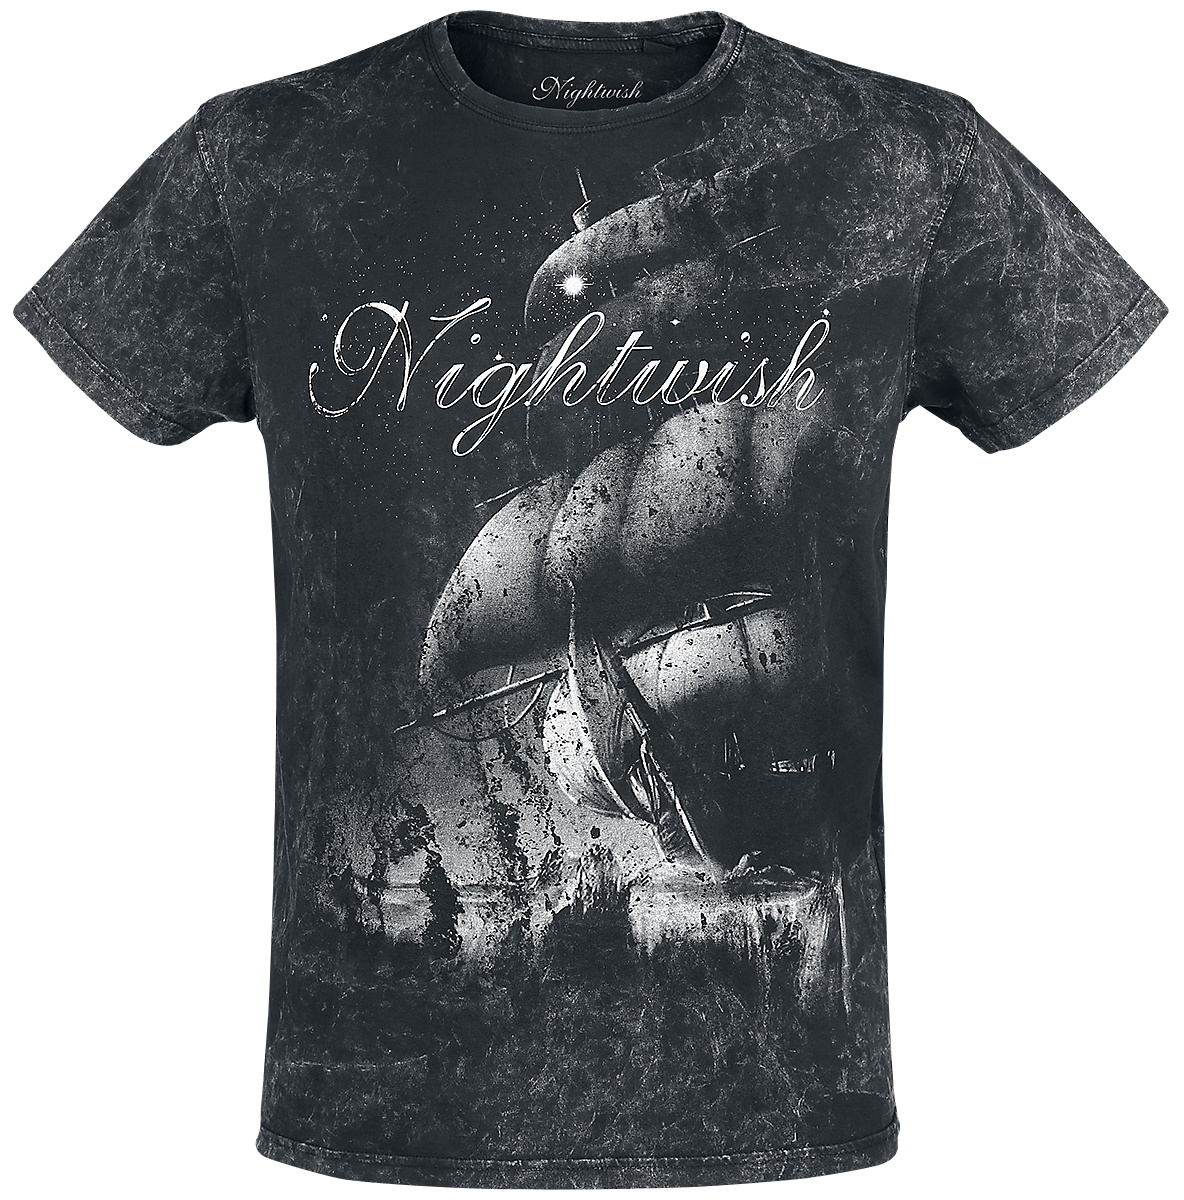 Nightwish - Woe To All - T-Shirt - black image